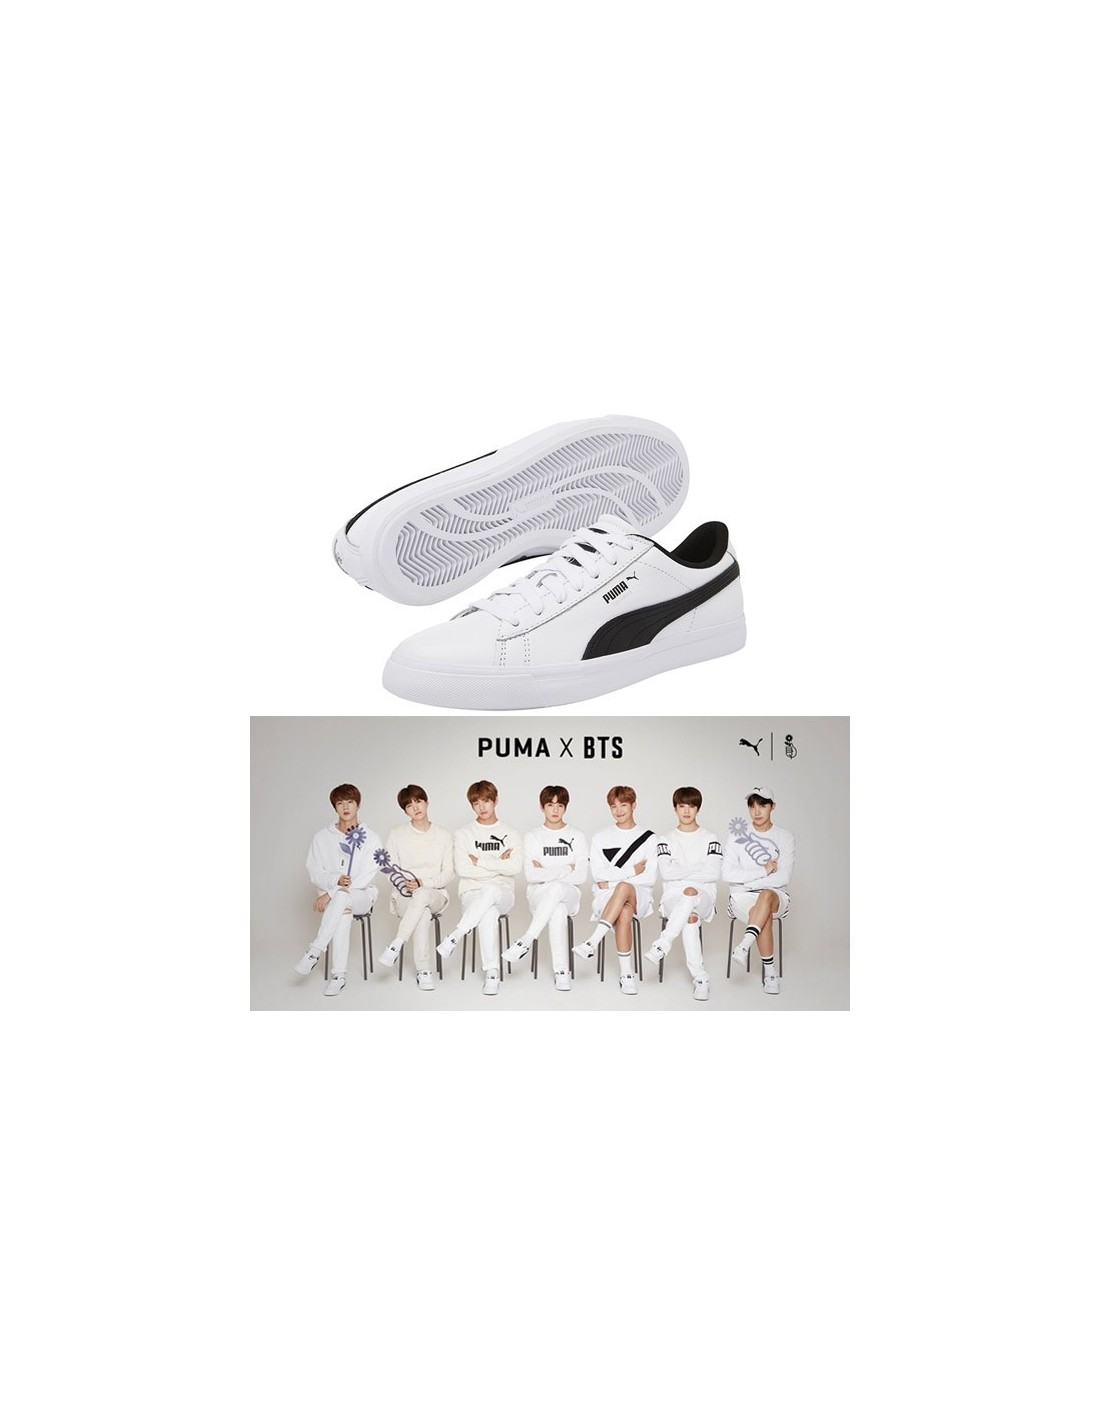 8295c148b915 BTS x PUMA Court Star Shoes